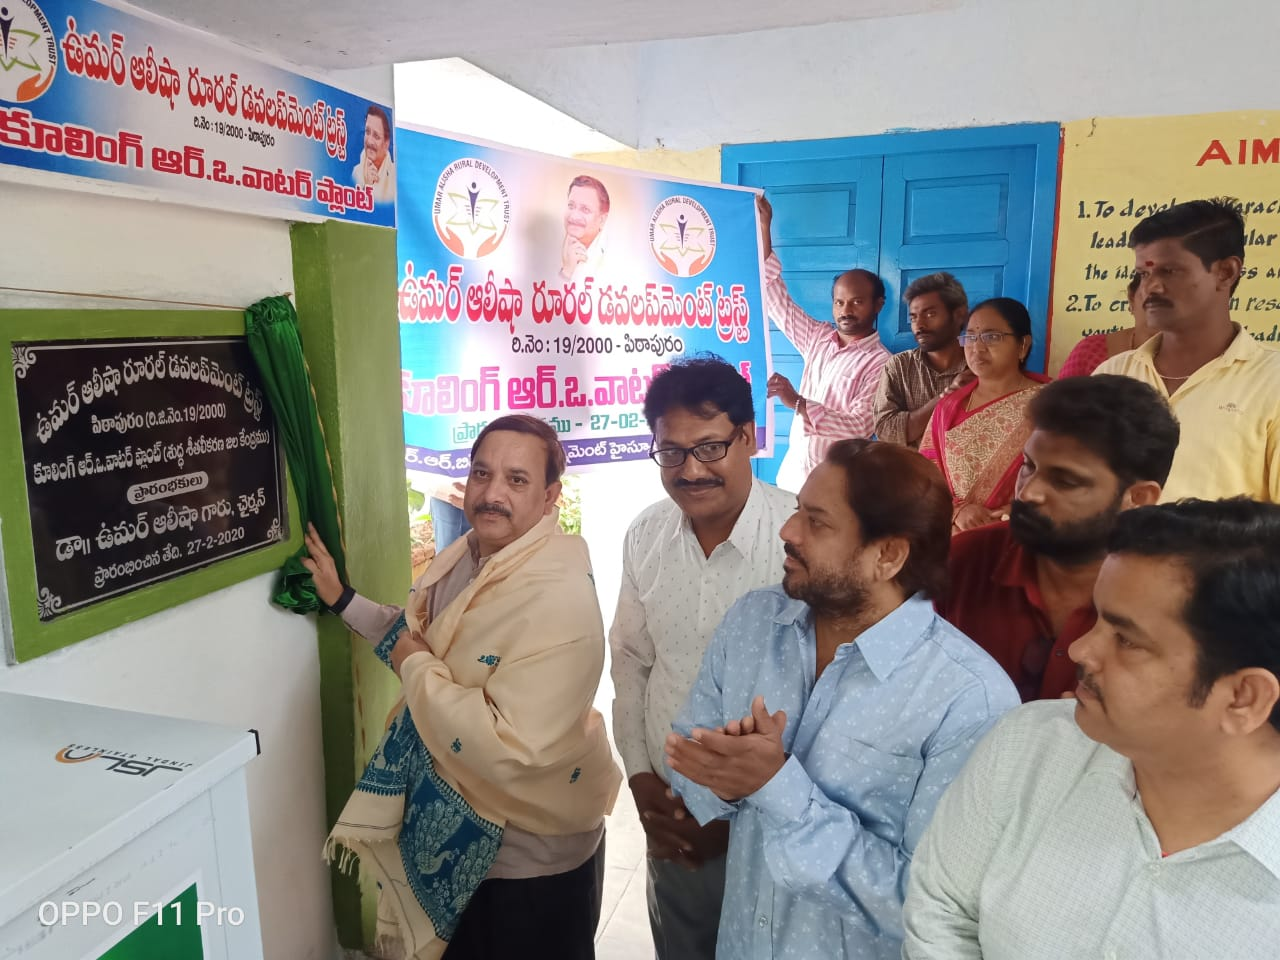 Inauguration of RO water plant by Dr.Umar Alisha, Chairman of UARDT at R.R.BH.R GOVT HIGH SCHOOL, Pithapuram